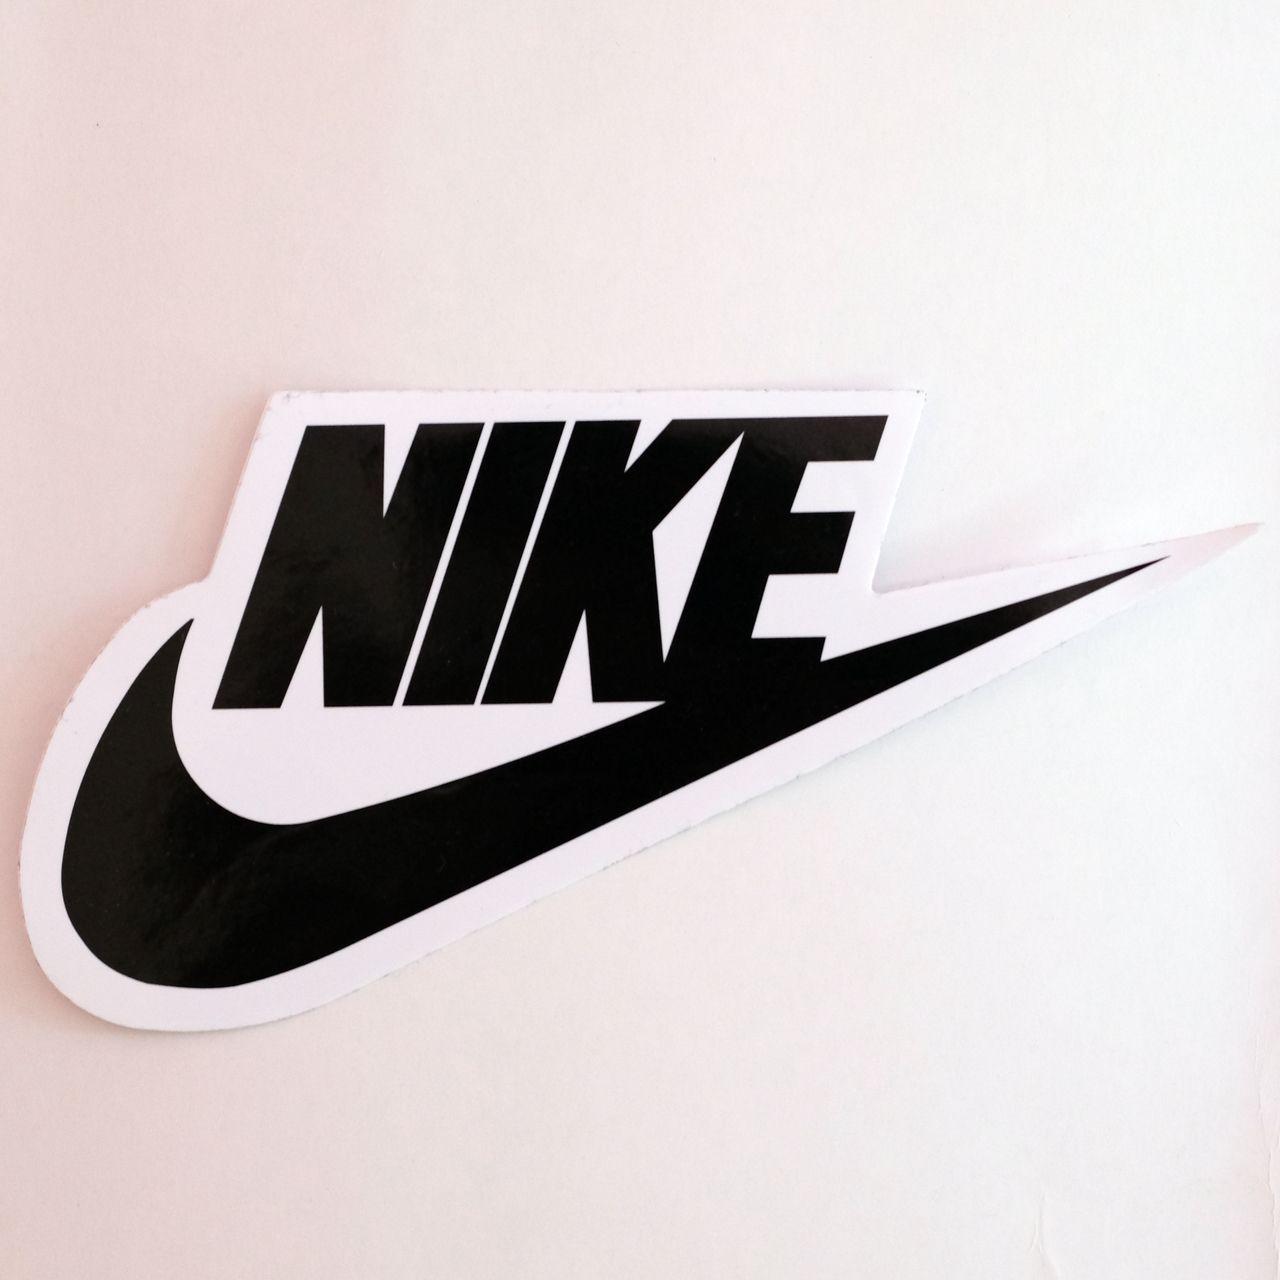 1775 nike black and white swoosh logo 13 x 7 cm decal sticker 1775 nike black and white swoosh logo 13 x 7 cm decal sticker amipublicfo Choice Image